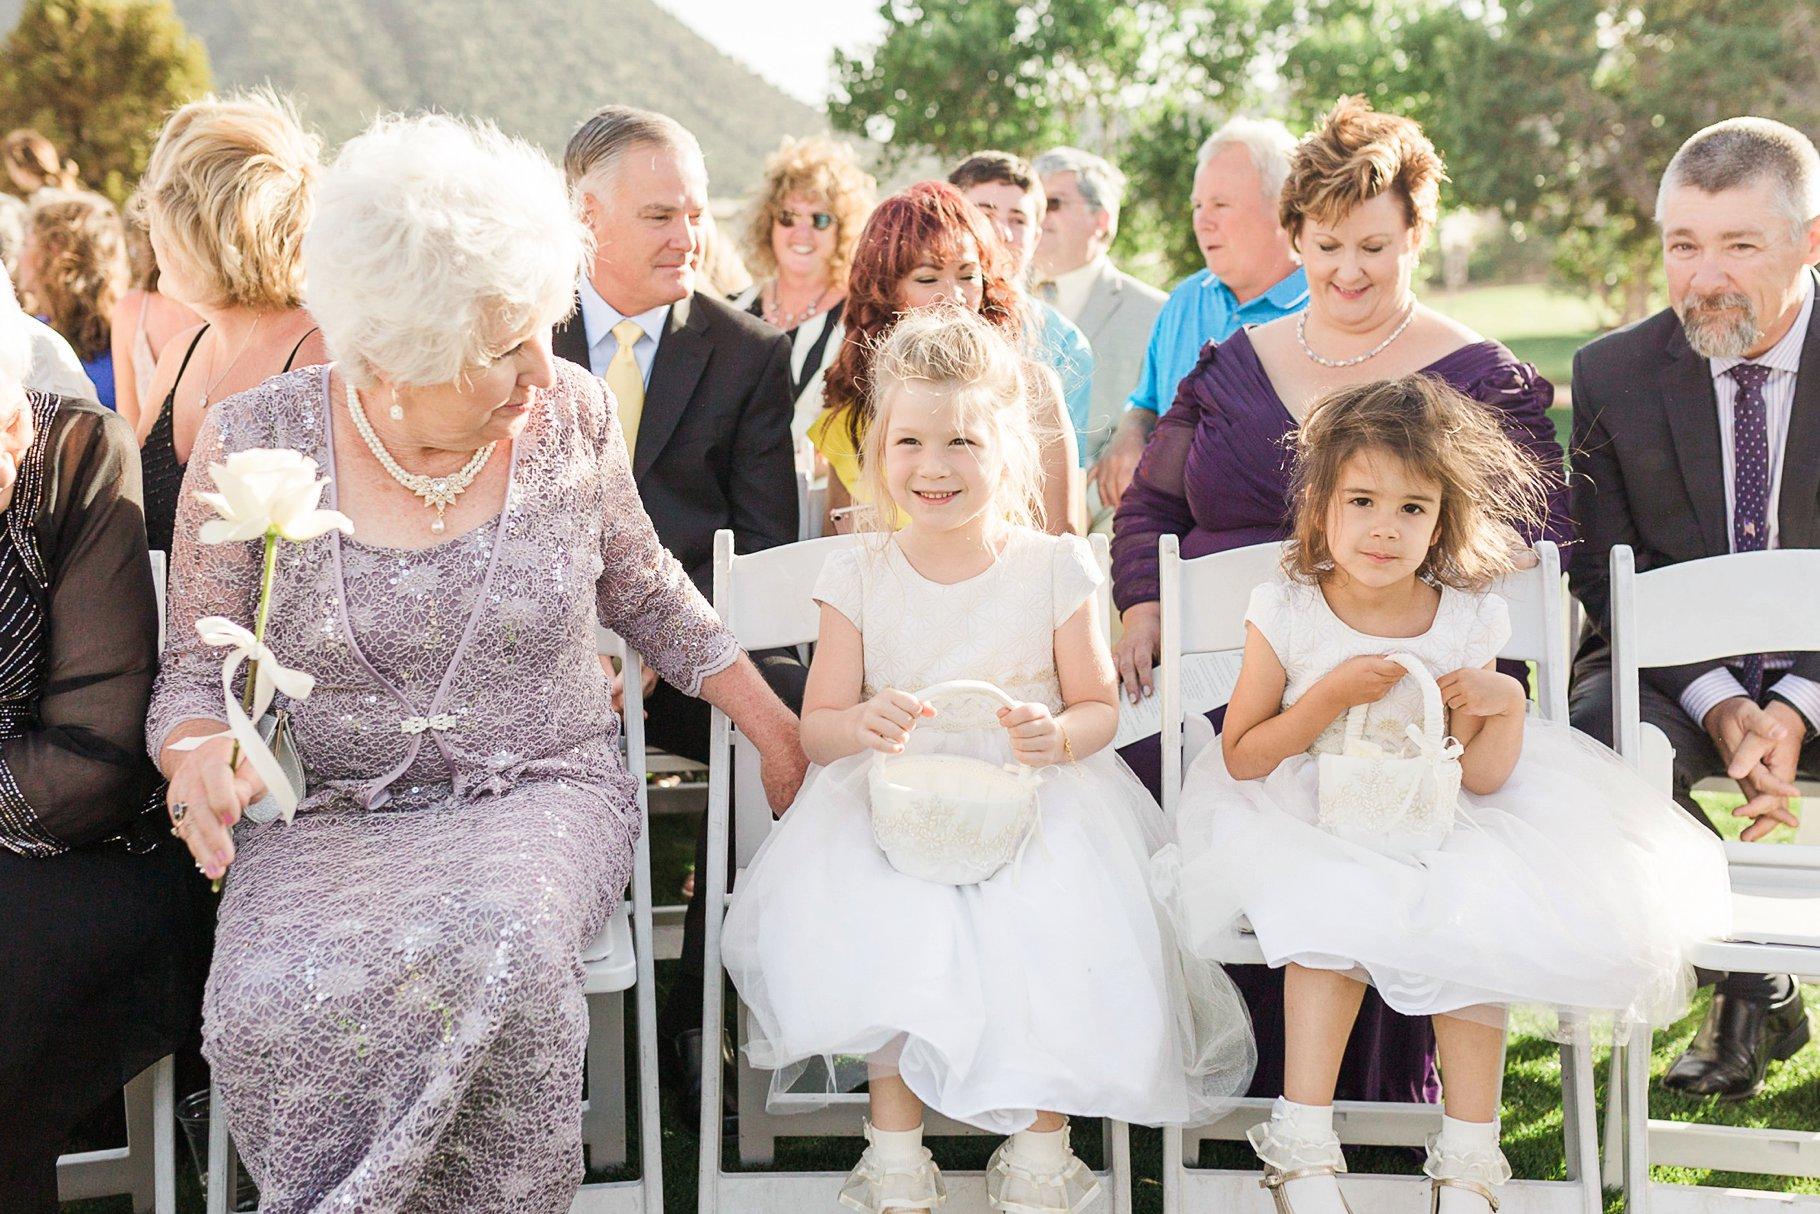 sedona wedding-60_GRETCHEN WAKEMAN PHOTOGRAPHY.jpg